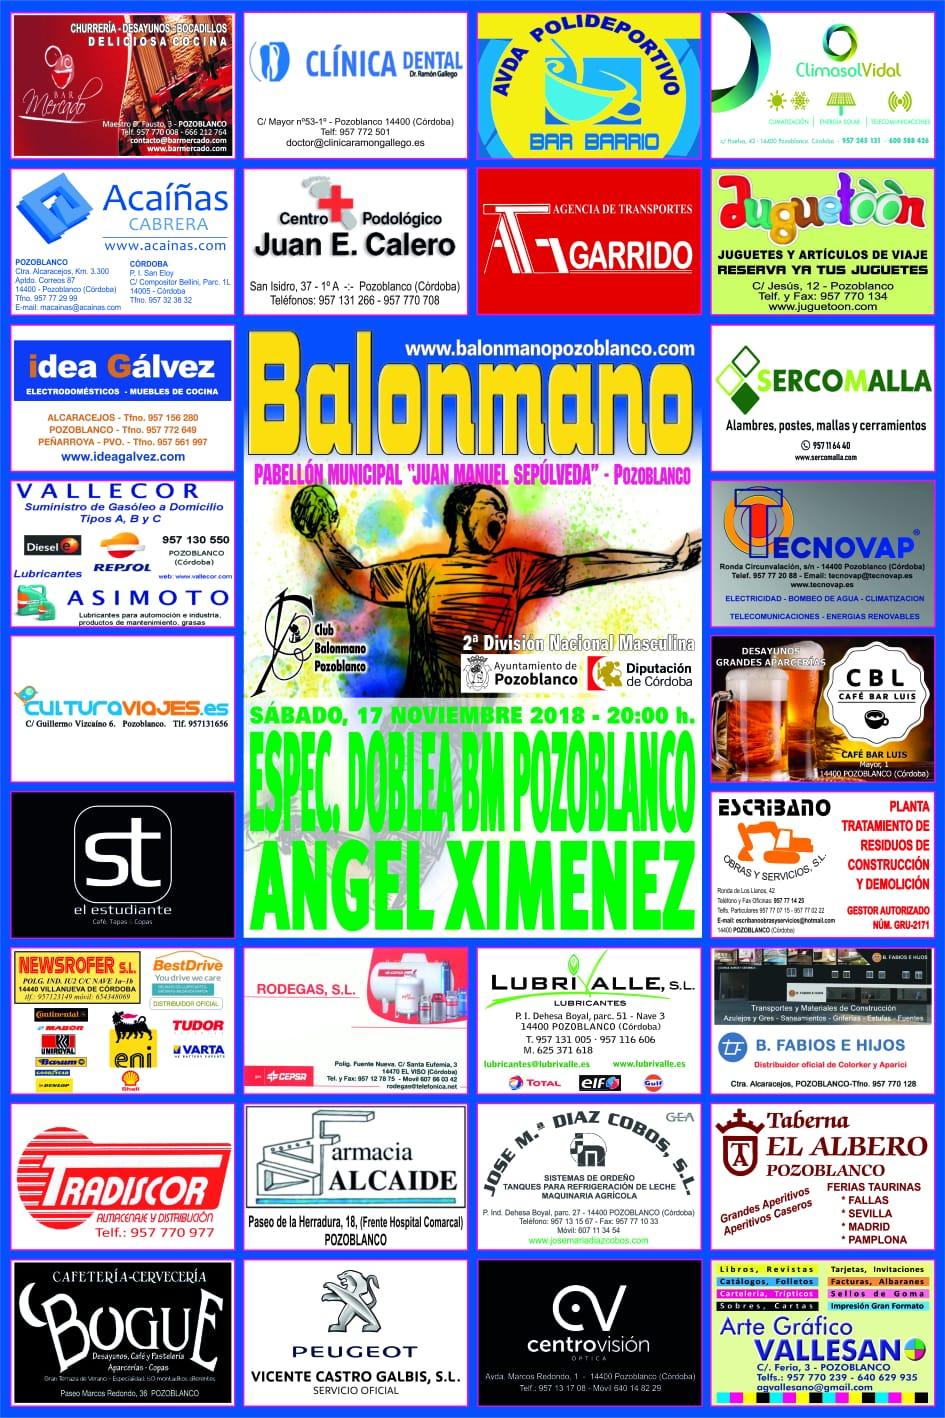 Balonmano Pozoblanco - Angel Ximenez - Noviembre 2018